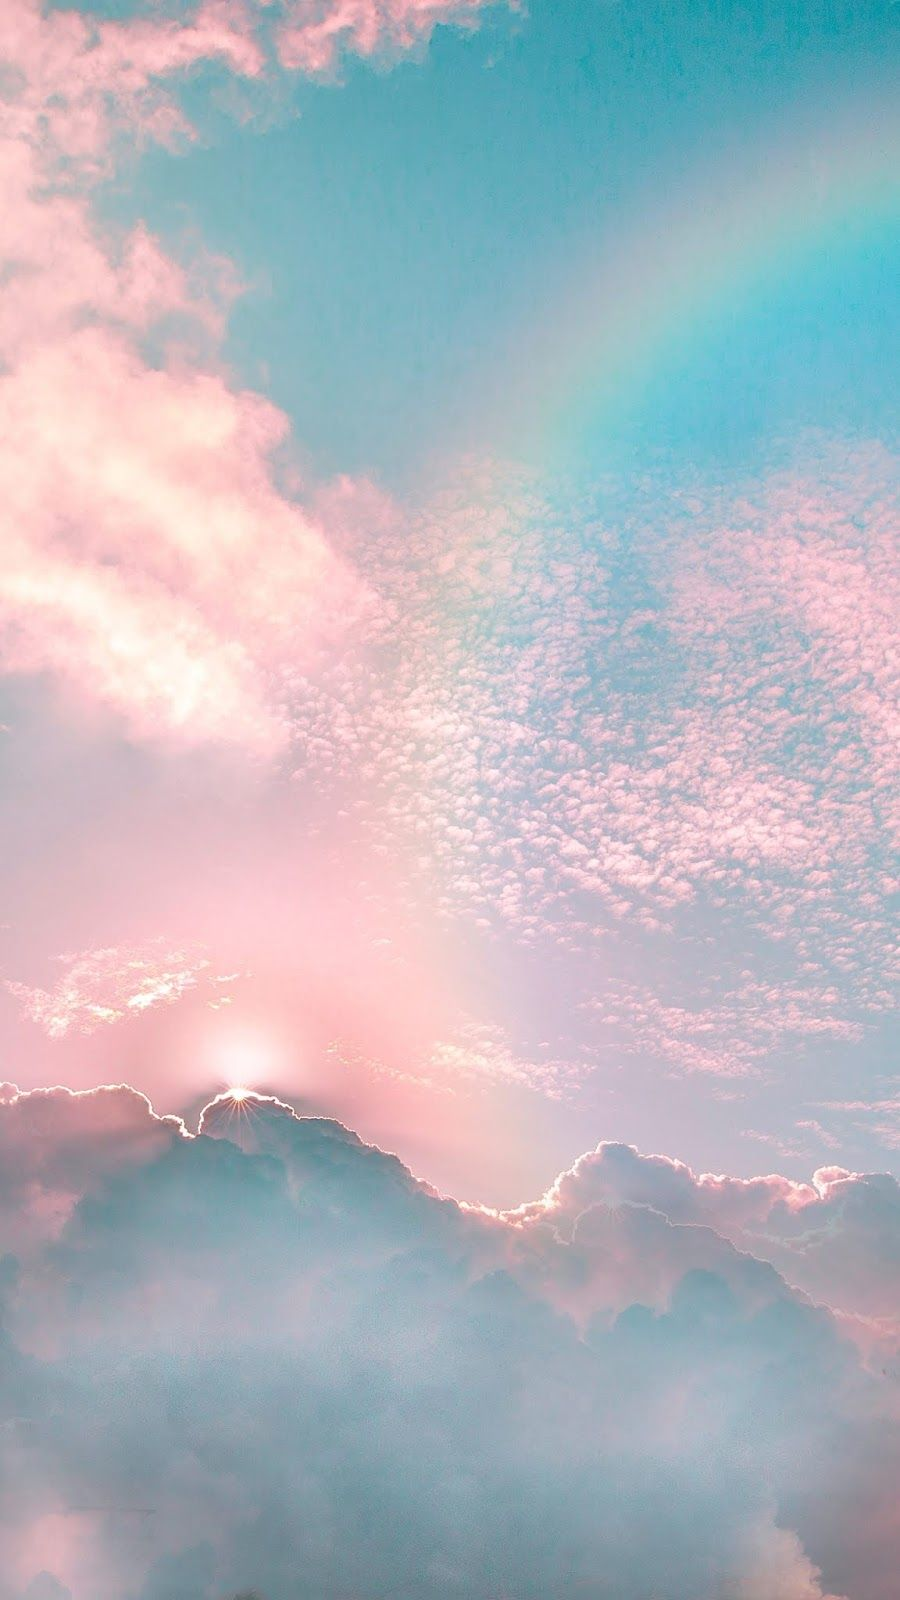 Aesthetic Rainbow Wallpaper Iphone